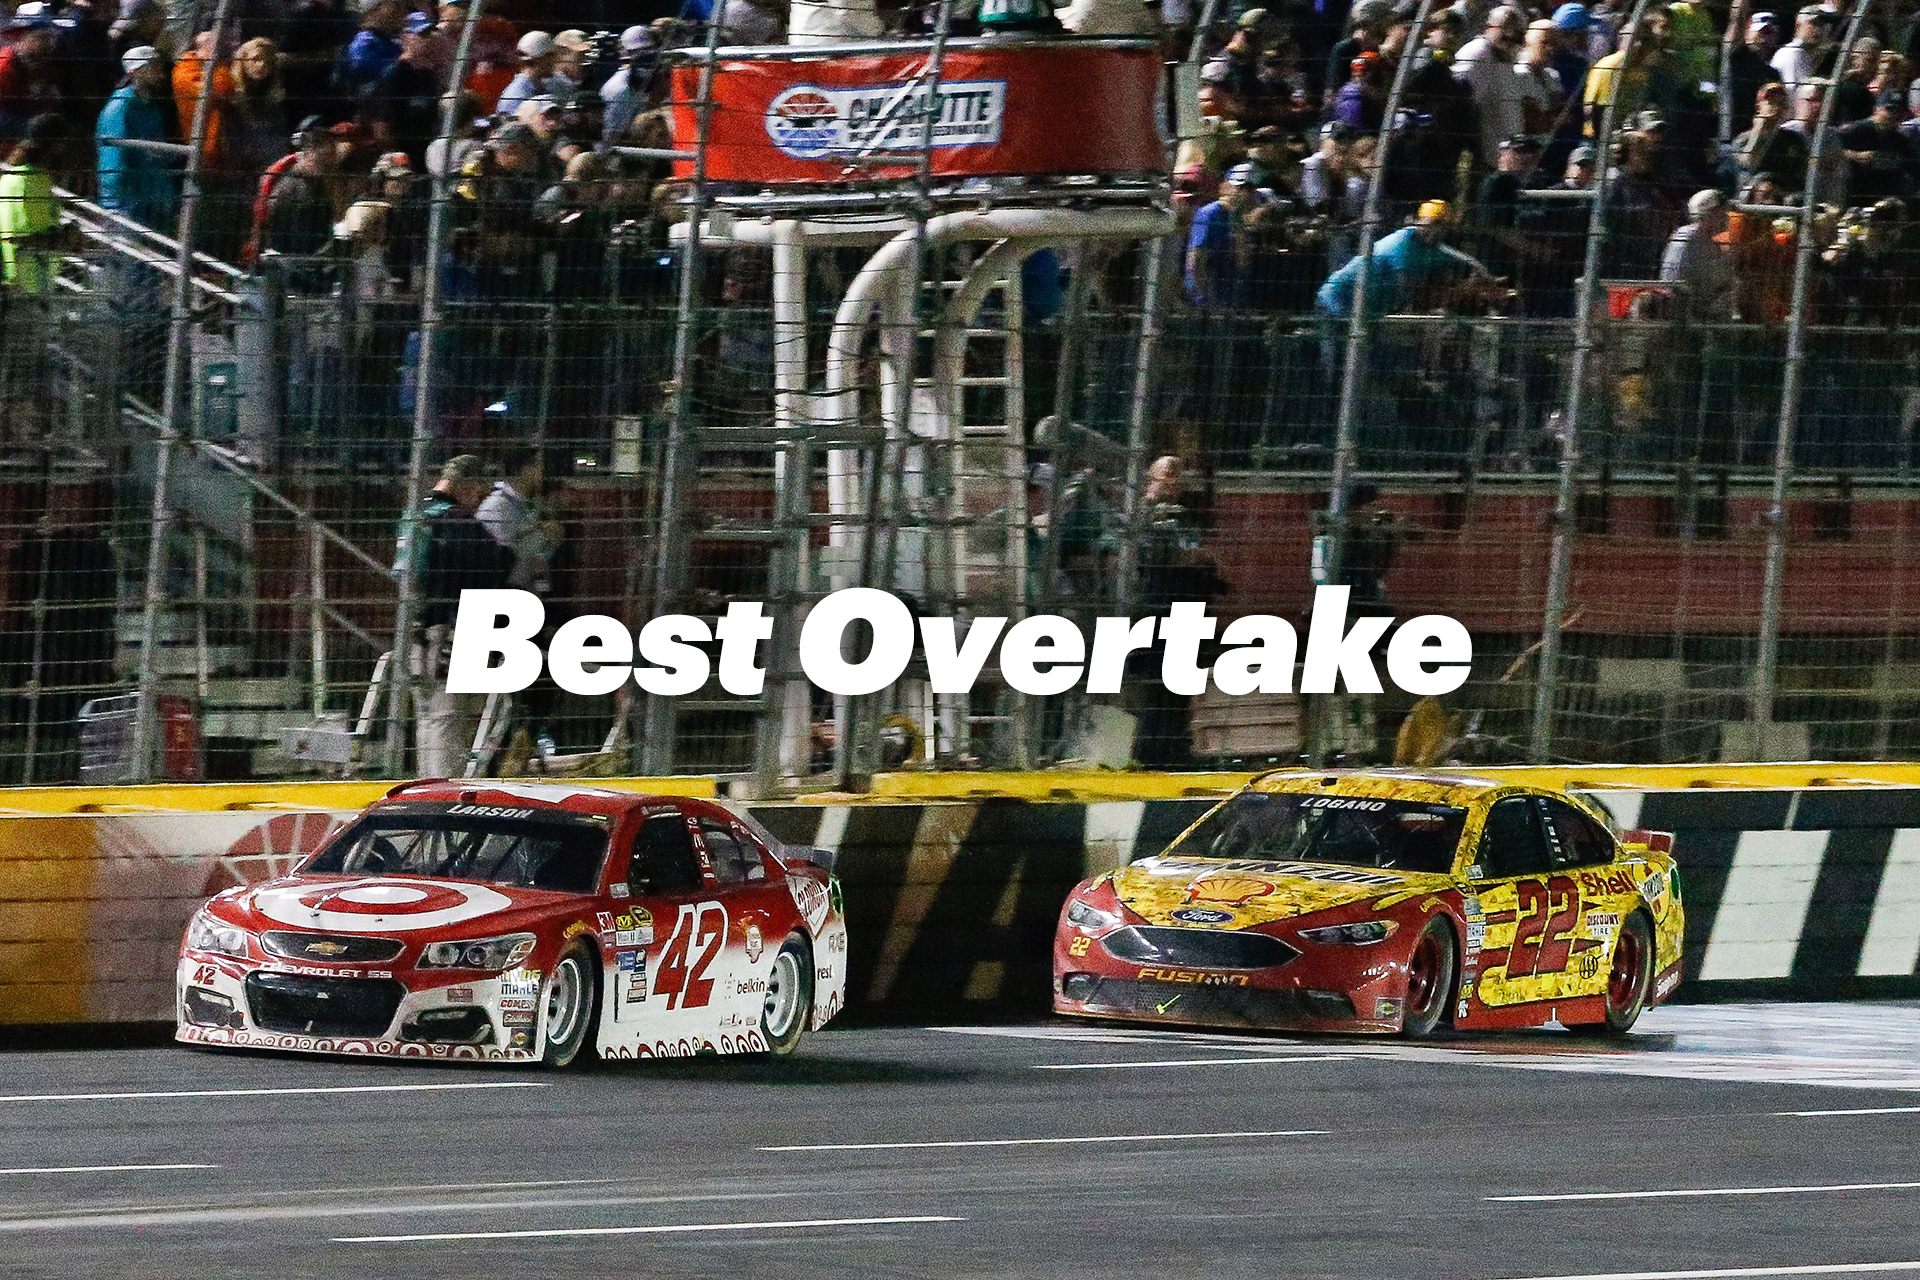 BestOvertake